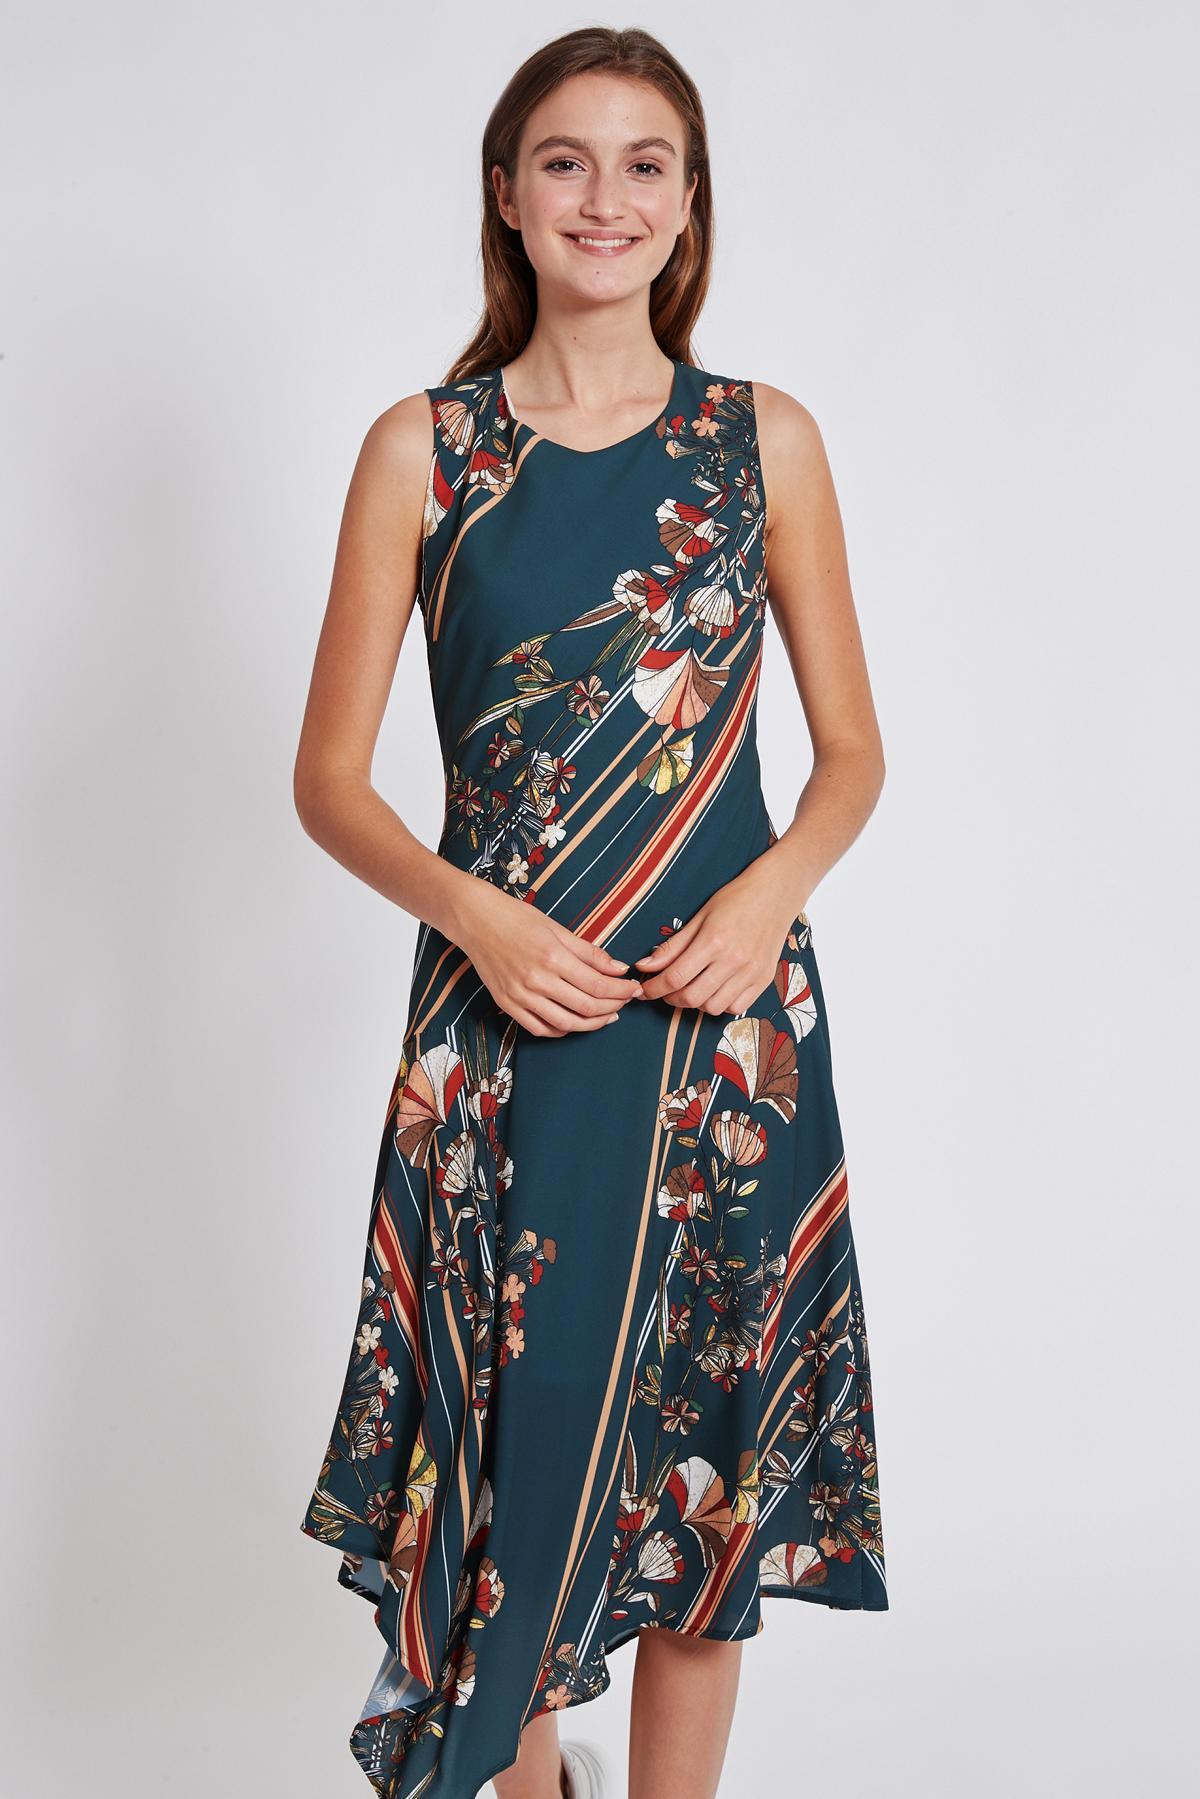 Front of Ana Alcazar Midi Dress Talusa  worn by model